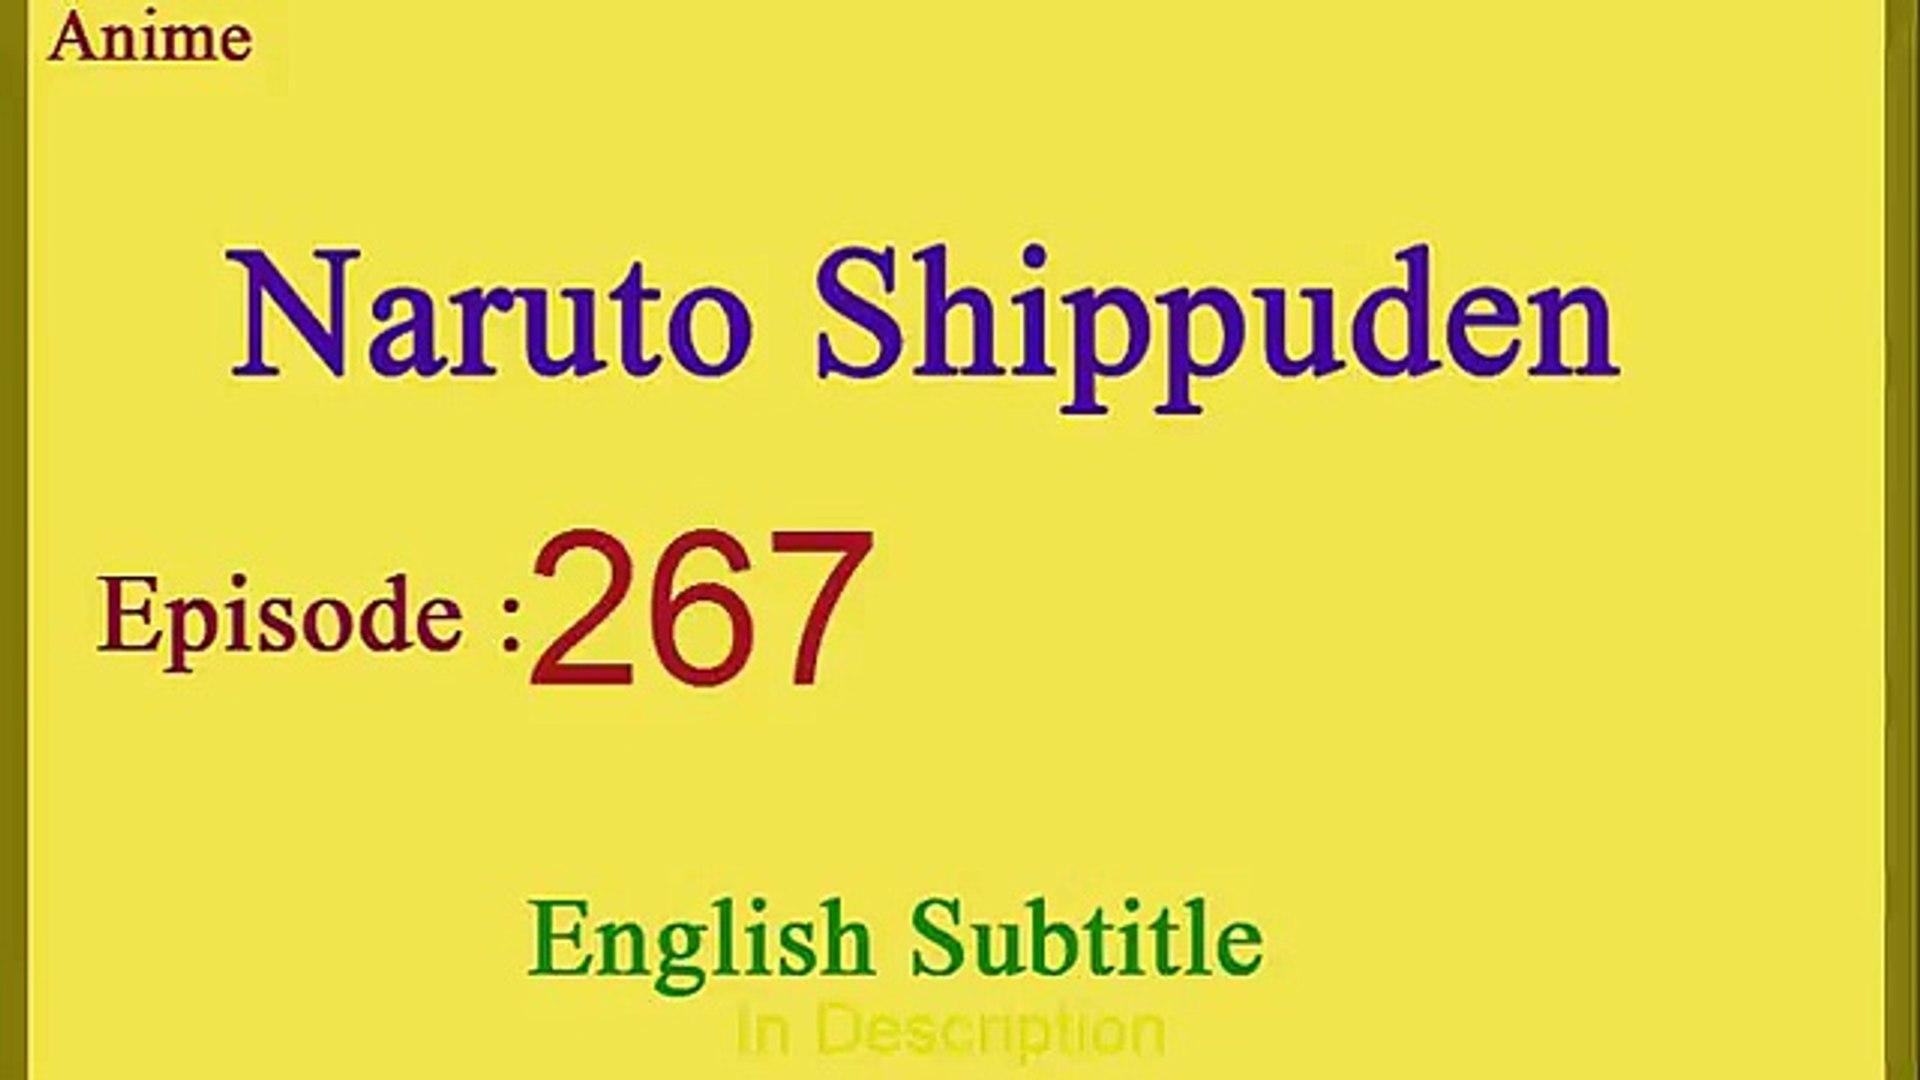 Naruto Shippuden English Subtitle Episode 267The Brilliant Military Advisor of the Hidden Leaf